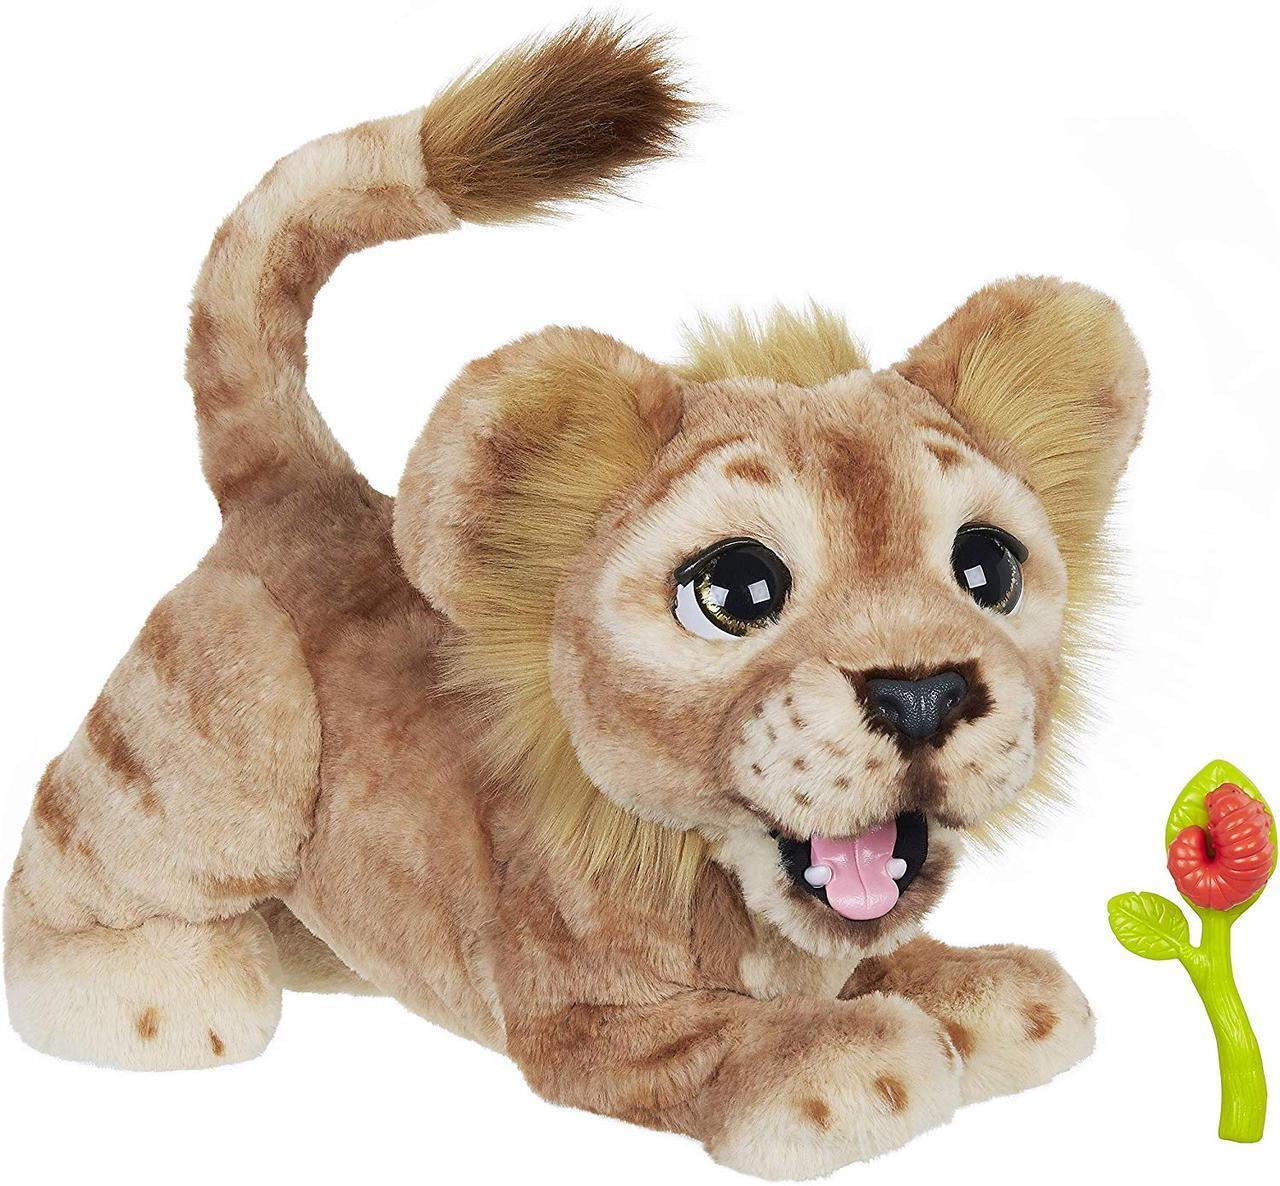 Король лев могучий Симба на анг.  Hasbro FurReal Disney Lion King Simba